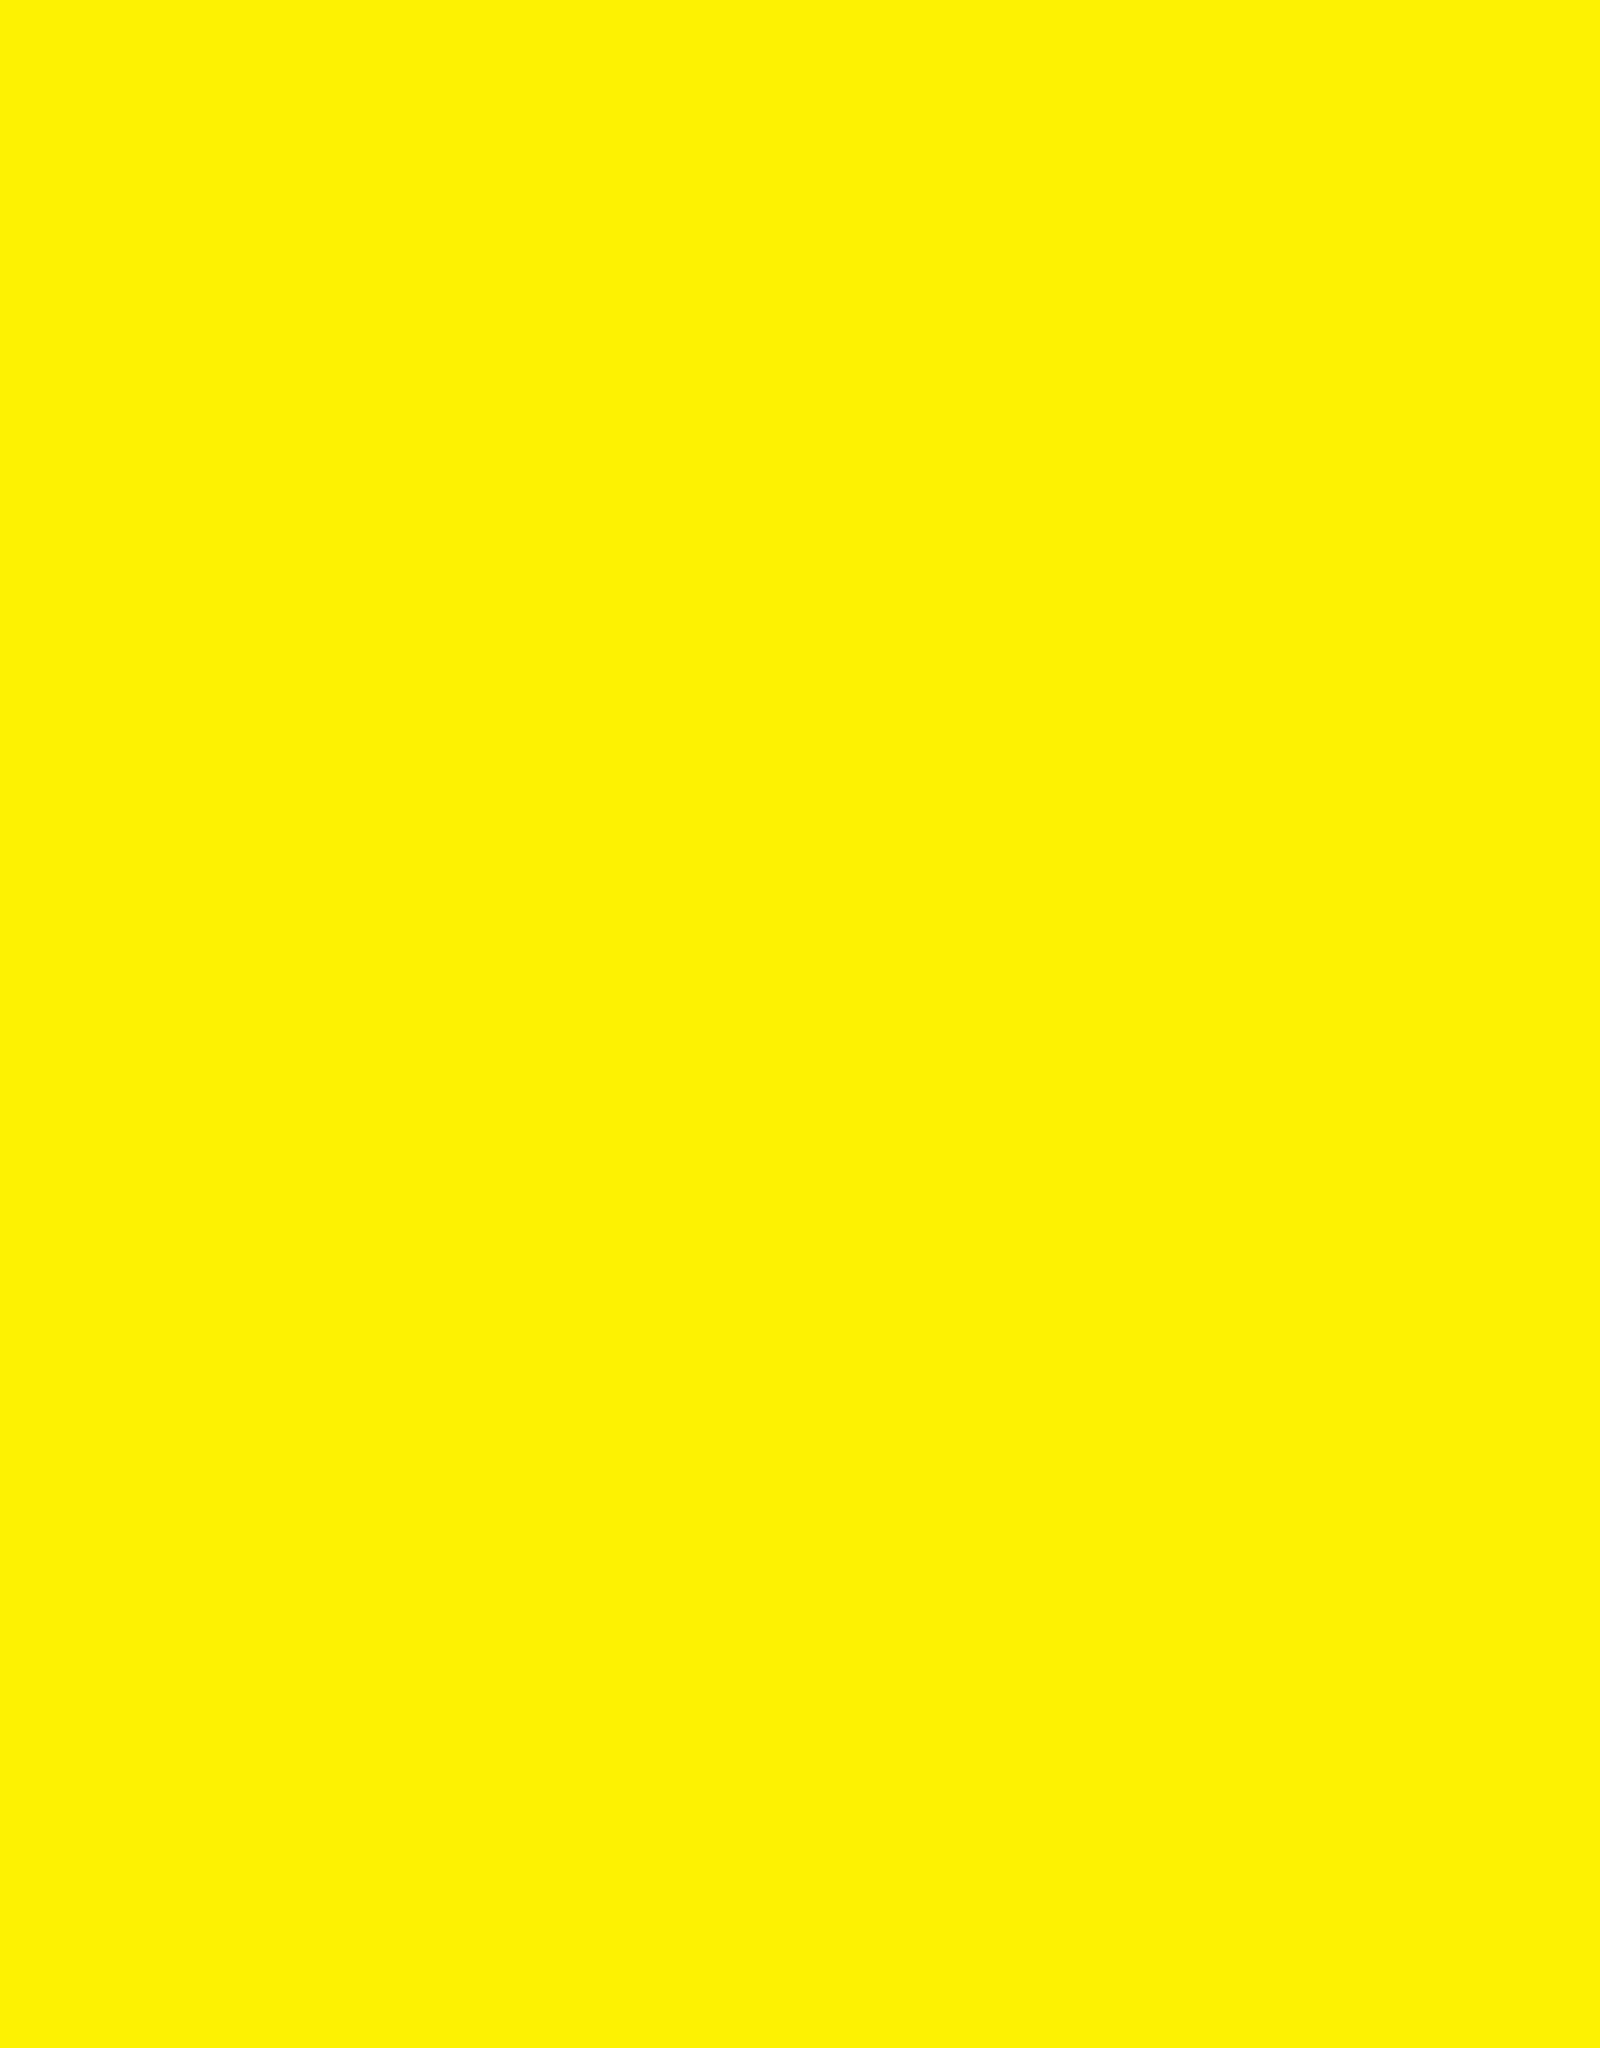 Jacquard Jacquard Screen Printing Ink #124 Opaque Yellow 16oz